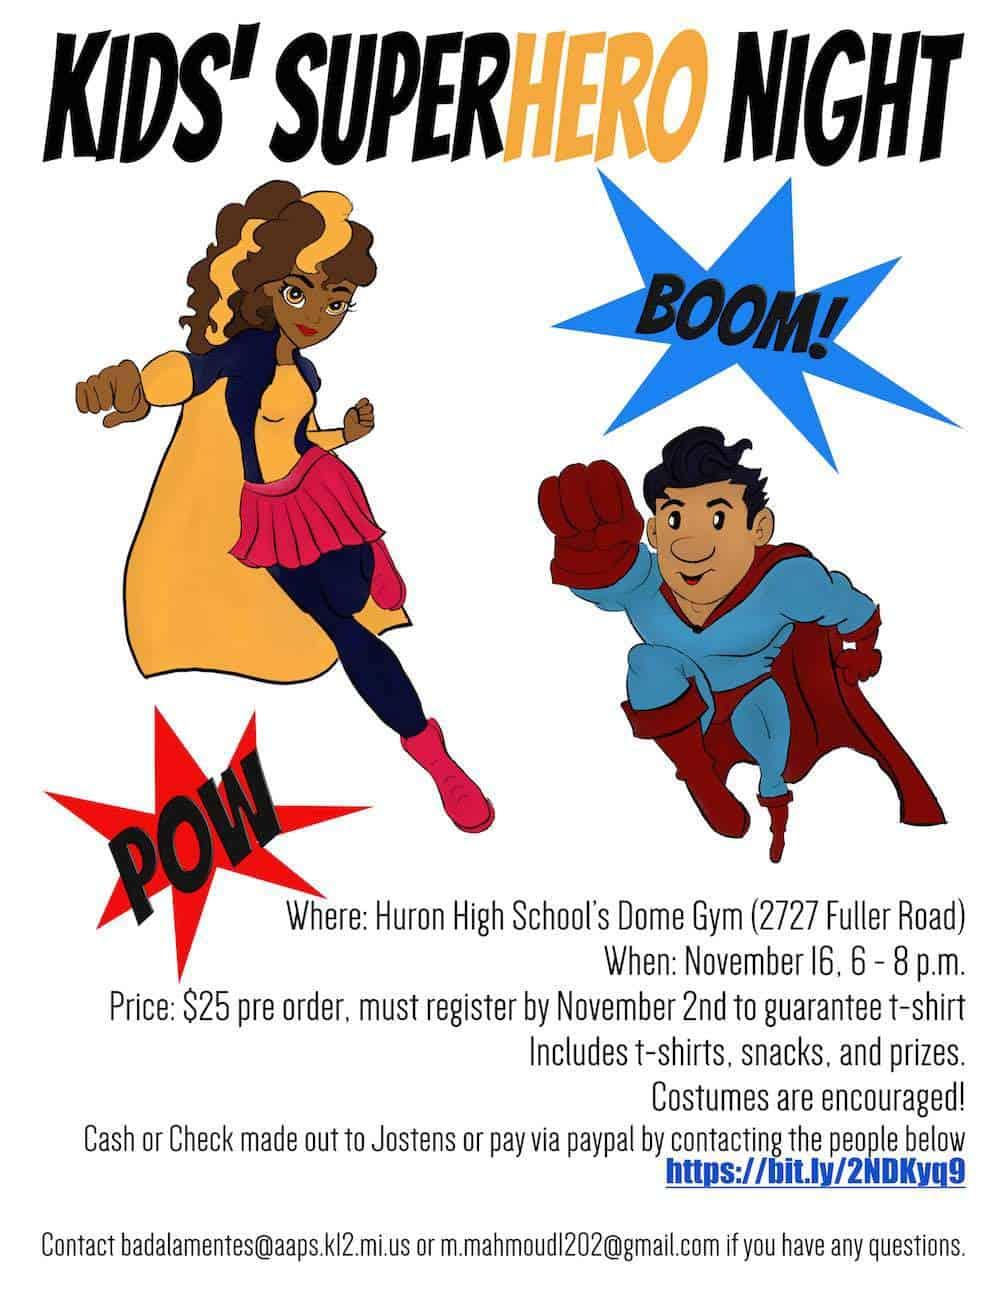 Kids Superhero Night Details